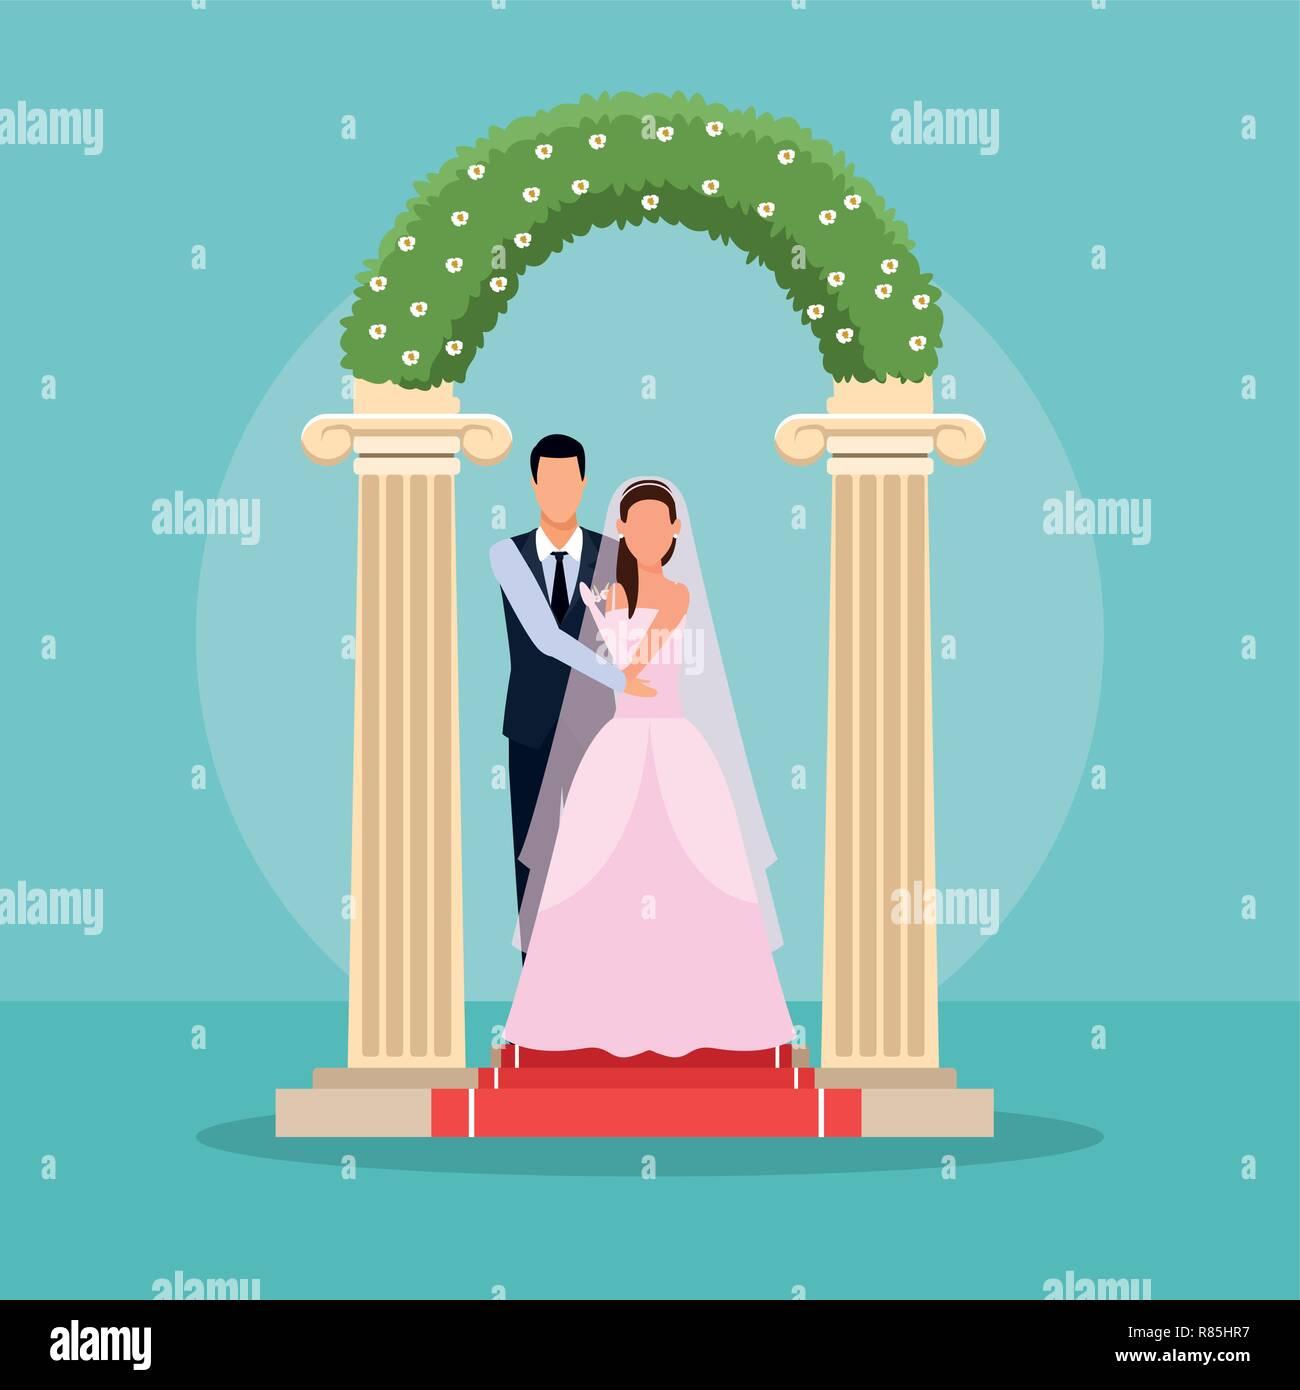 Wedding Couple Cartoon Stock Vector Image Art Alamy